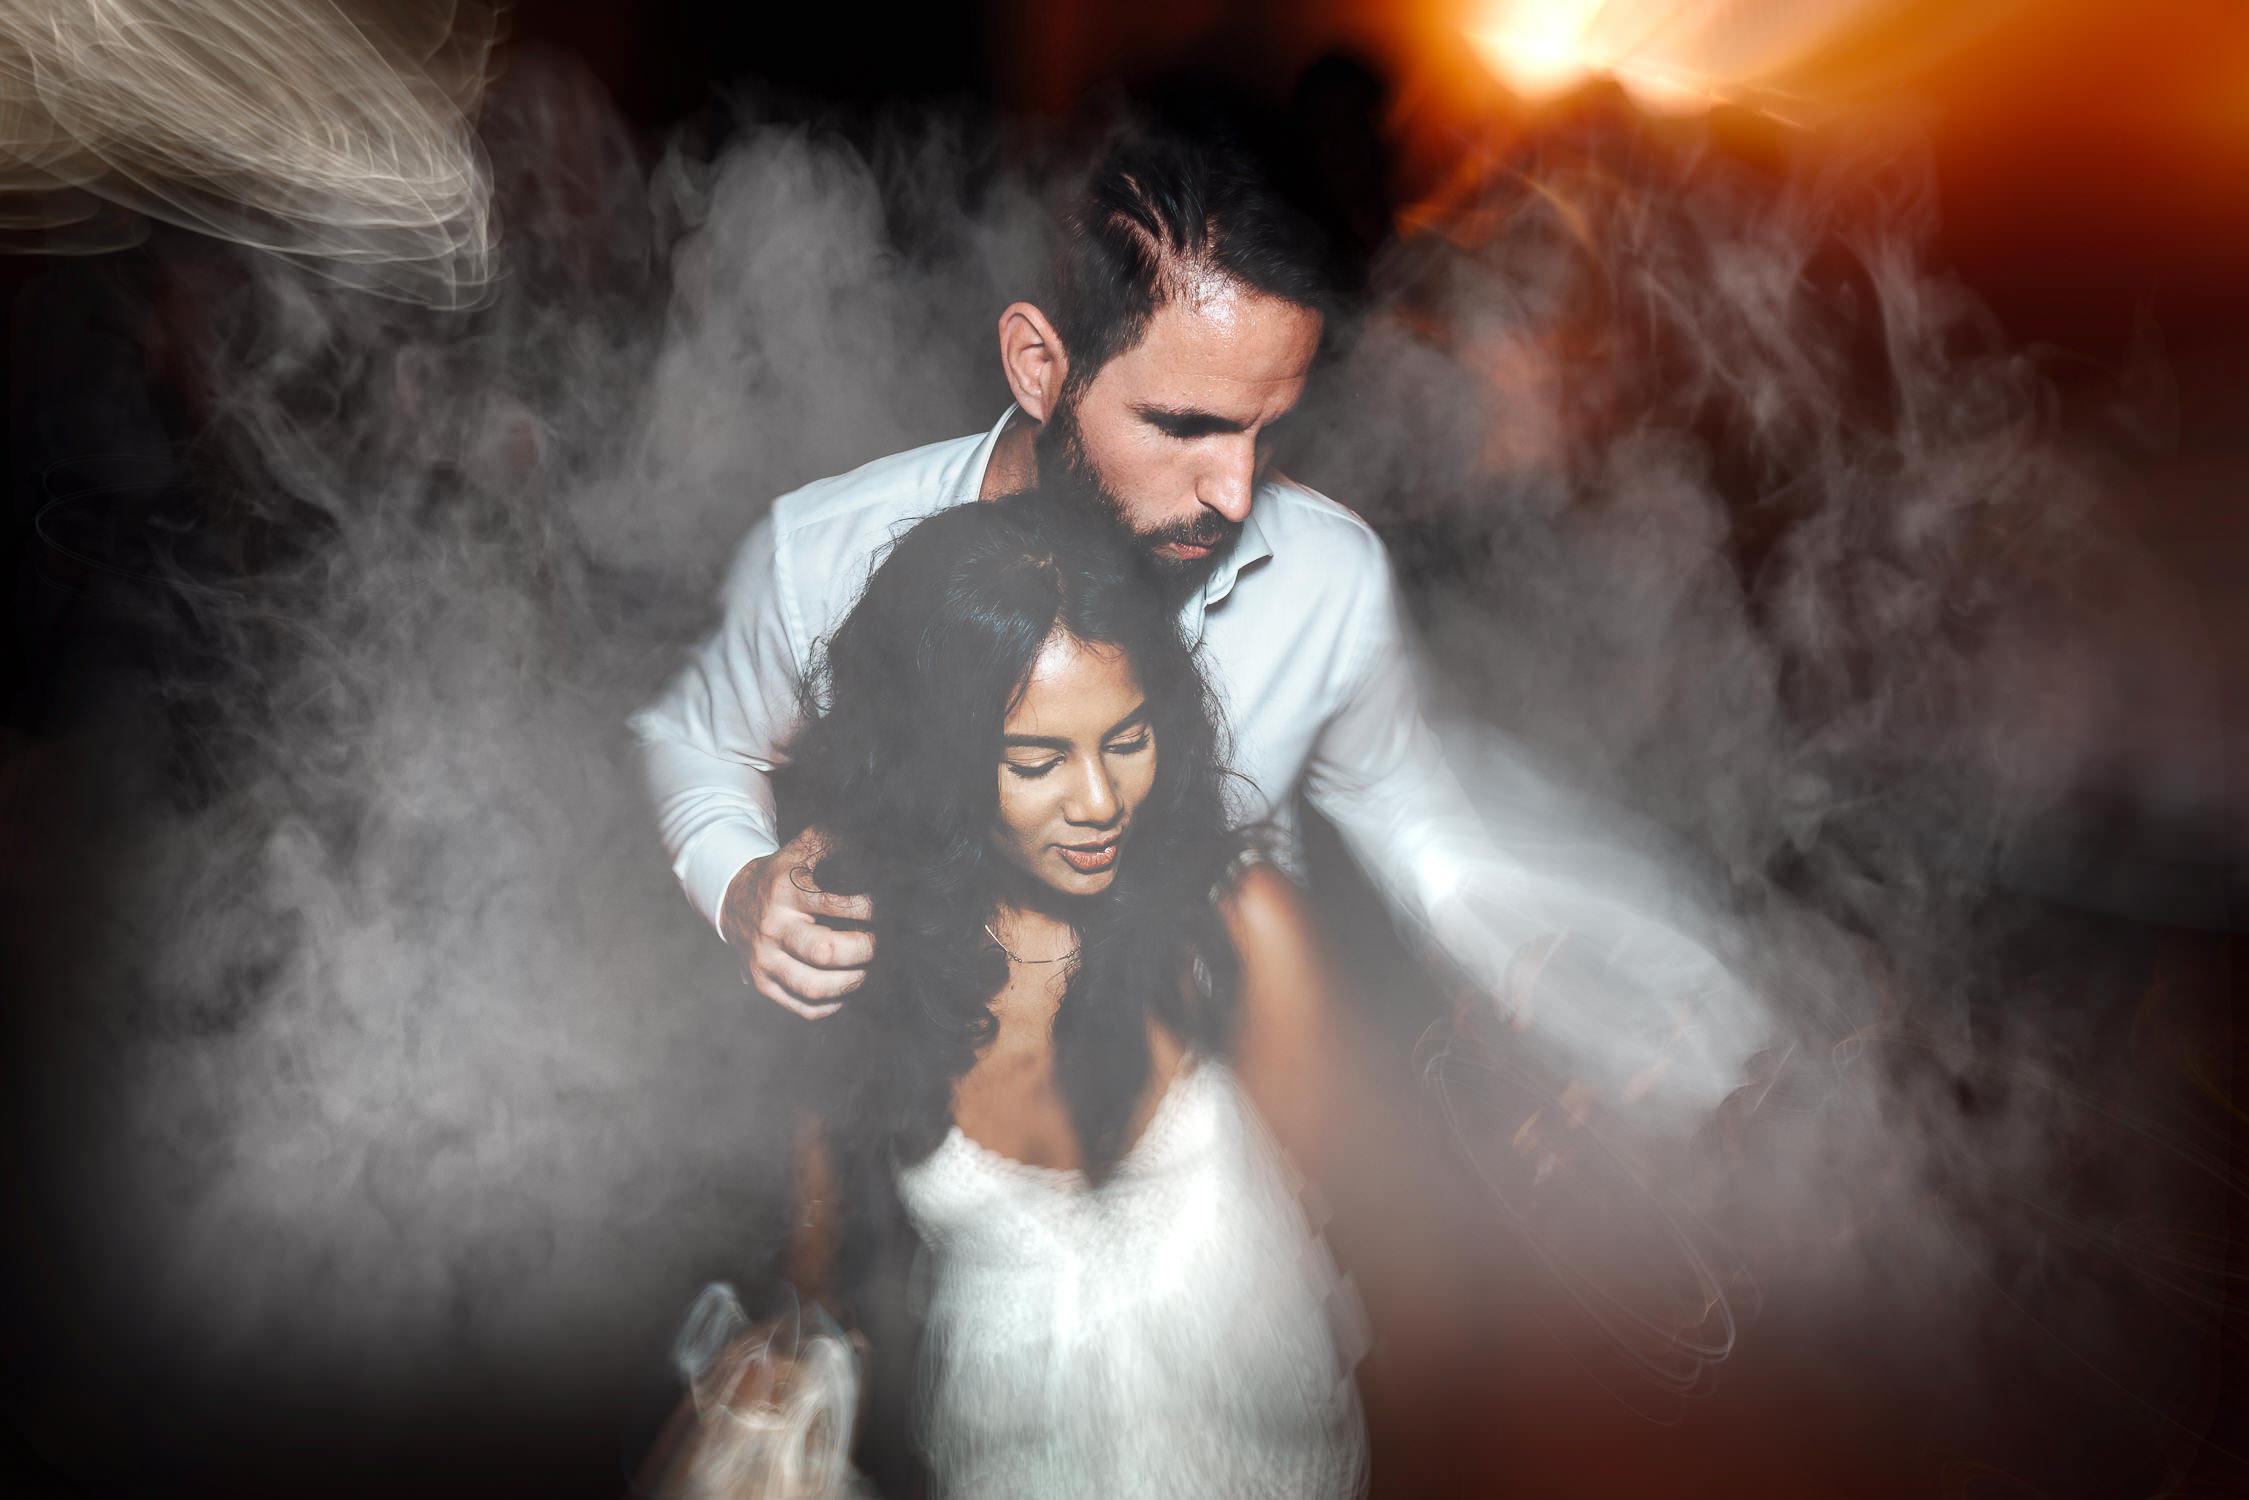 bruidsfotografie-trouwfotograaf-amsterdam-utrecht-mark-hadden-judith-igor-600-Edit.jpg